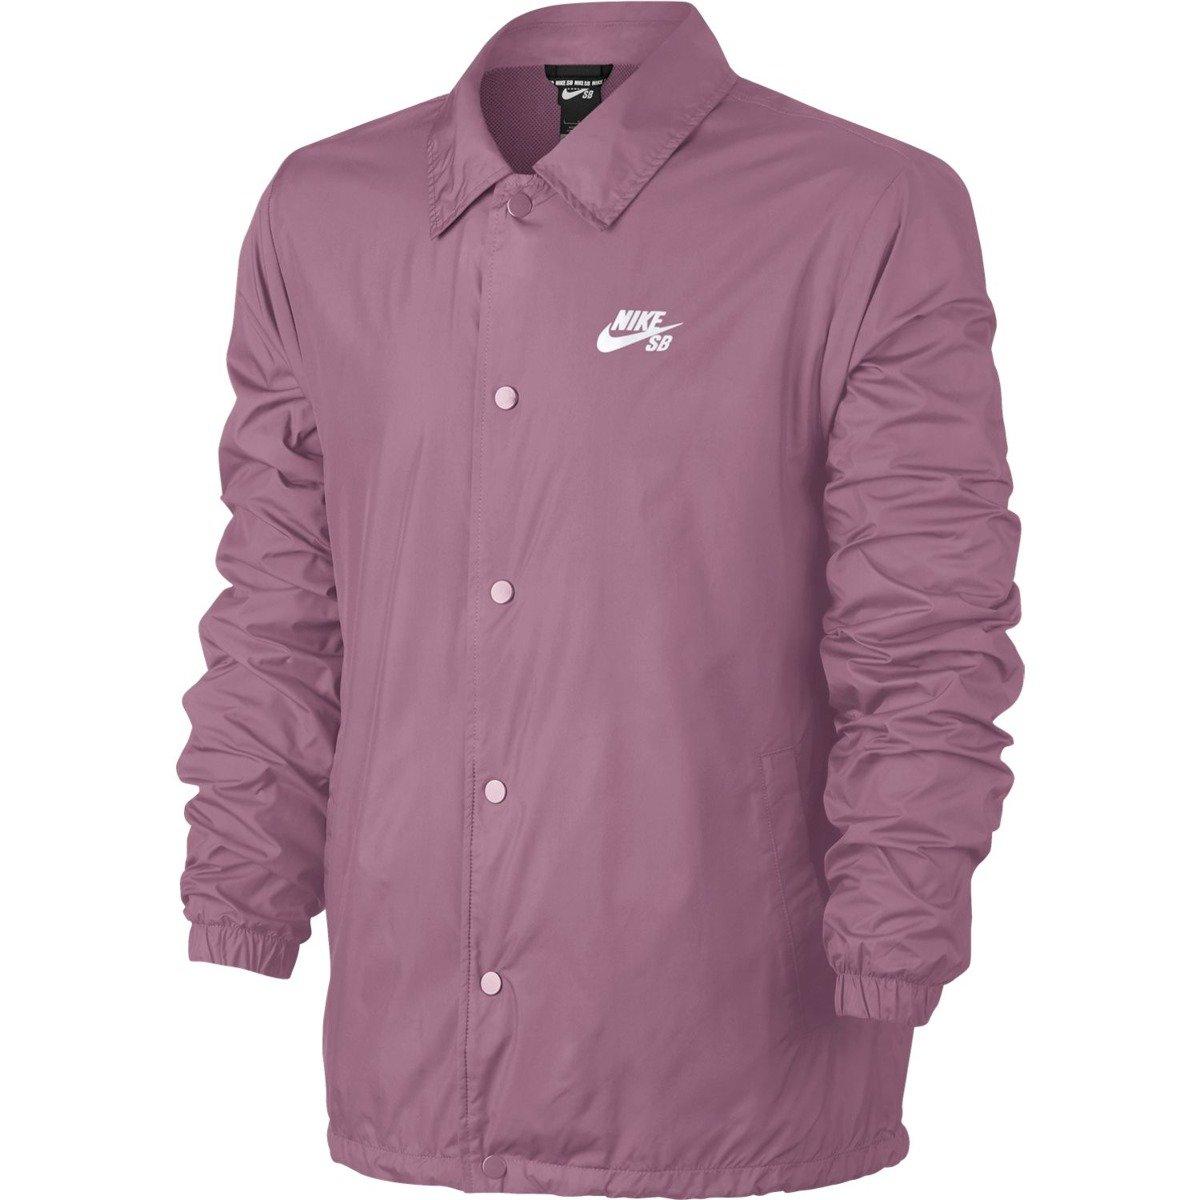 nike sb shield jacket elemental pink white pink  6ddba80da